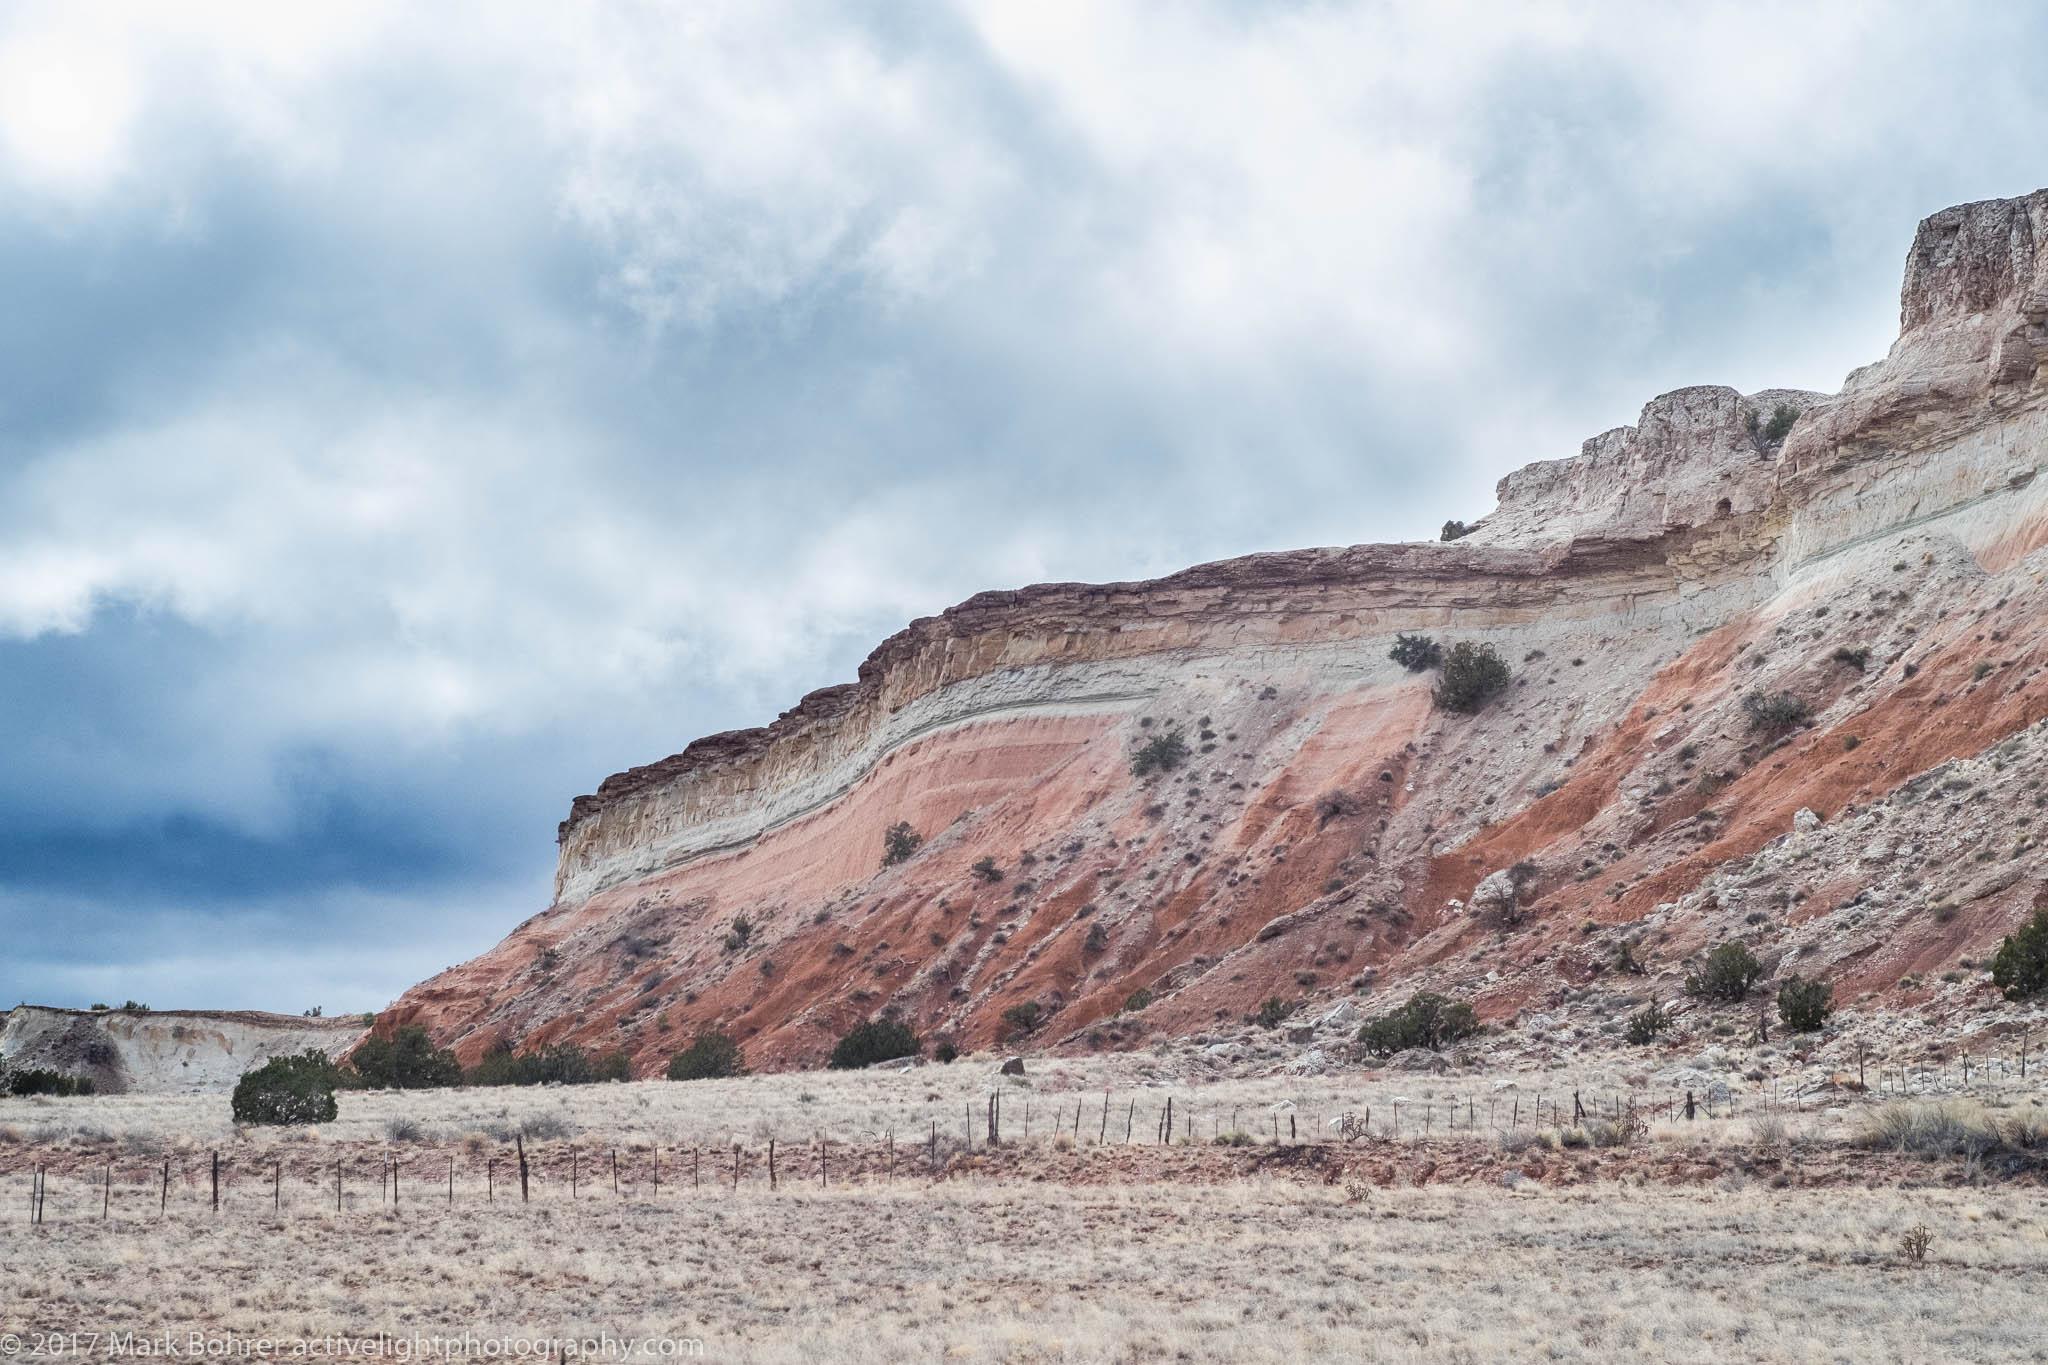 Desert landscape on US 550 near Cabezon Peak, New Mexico